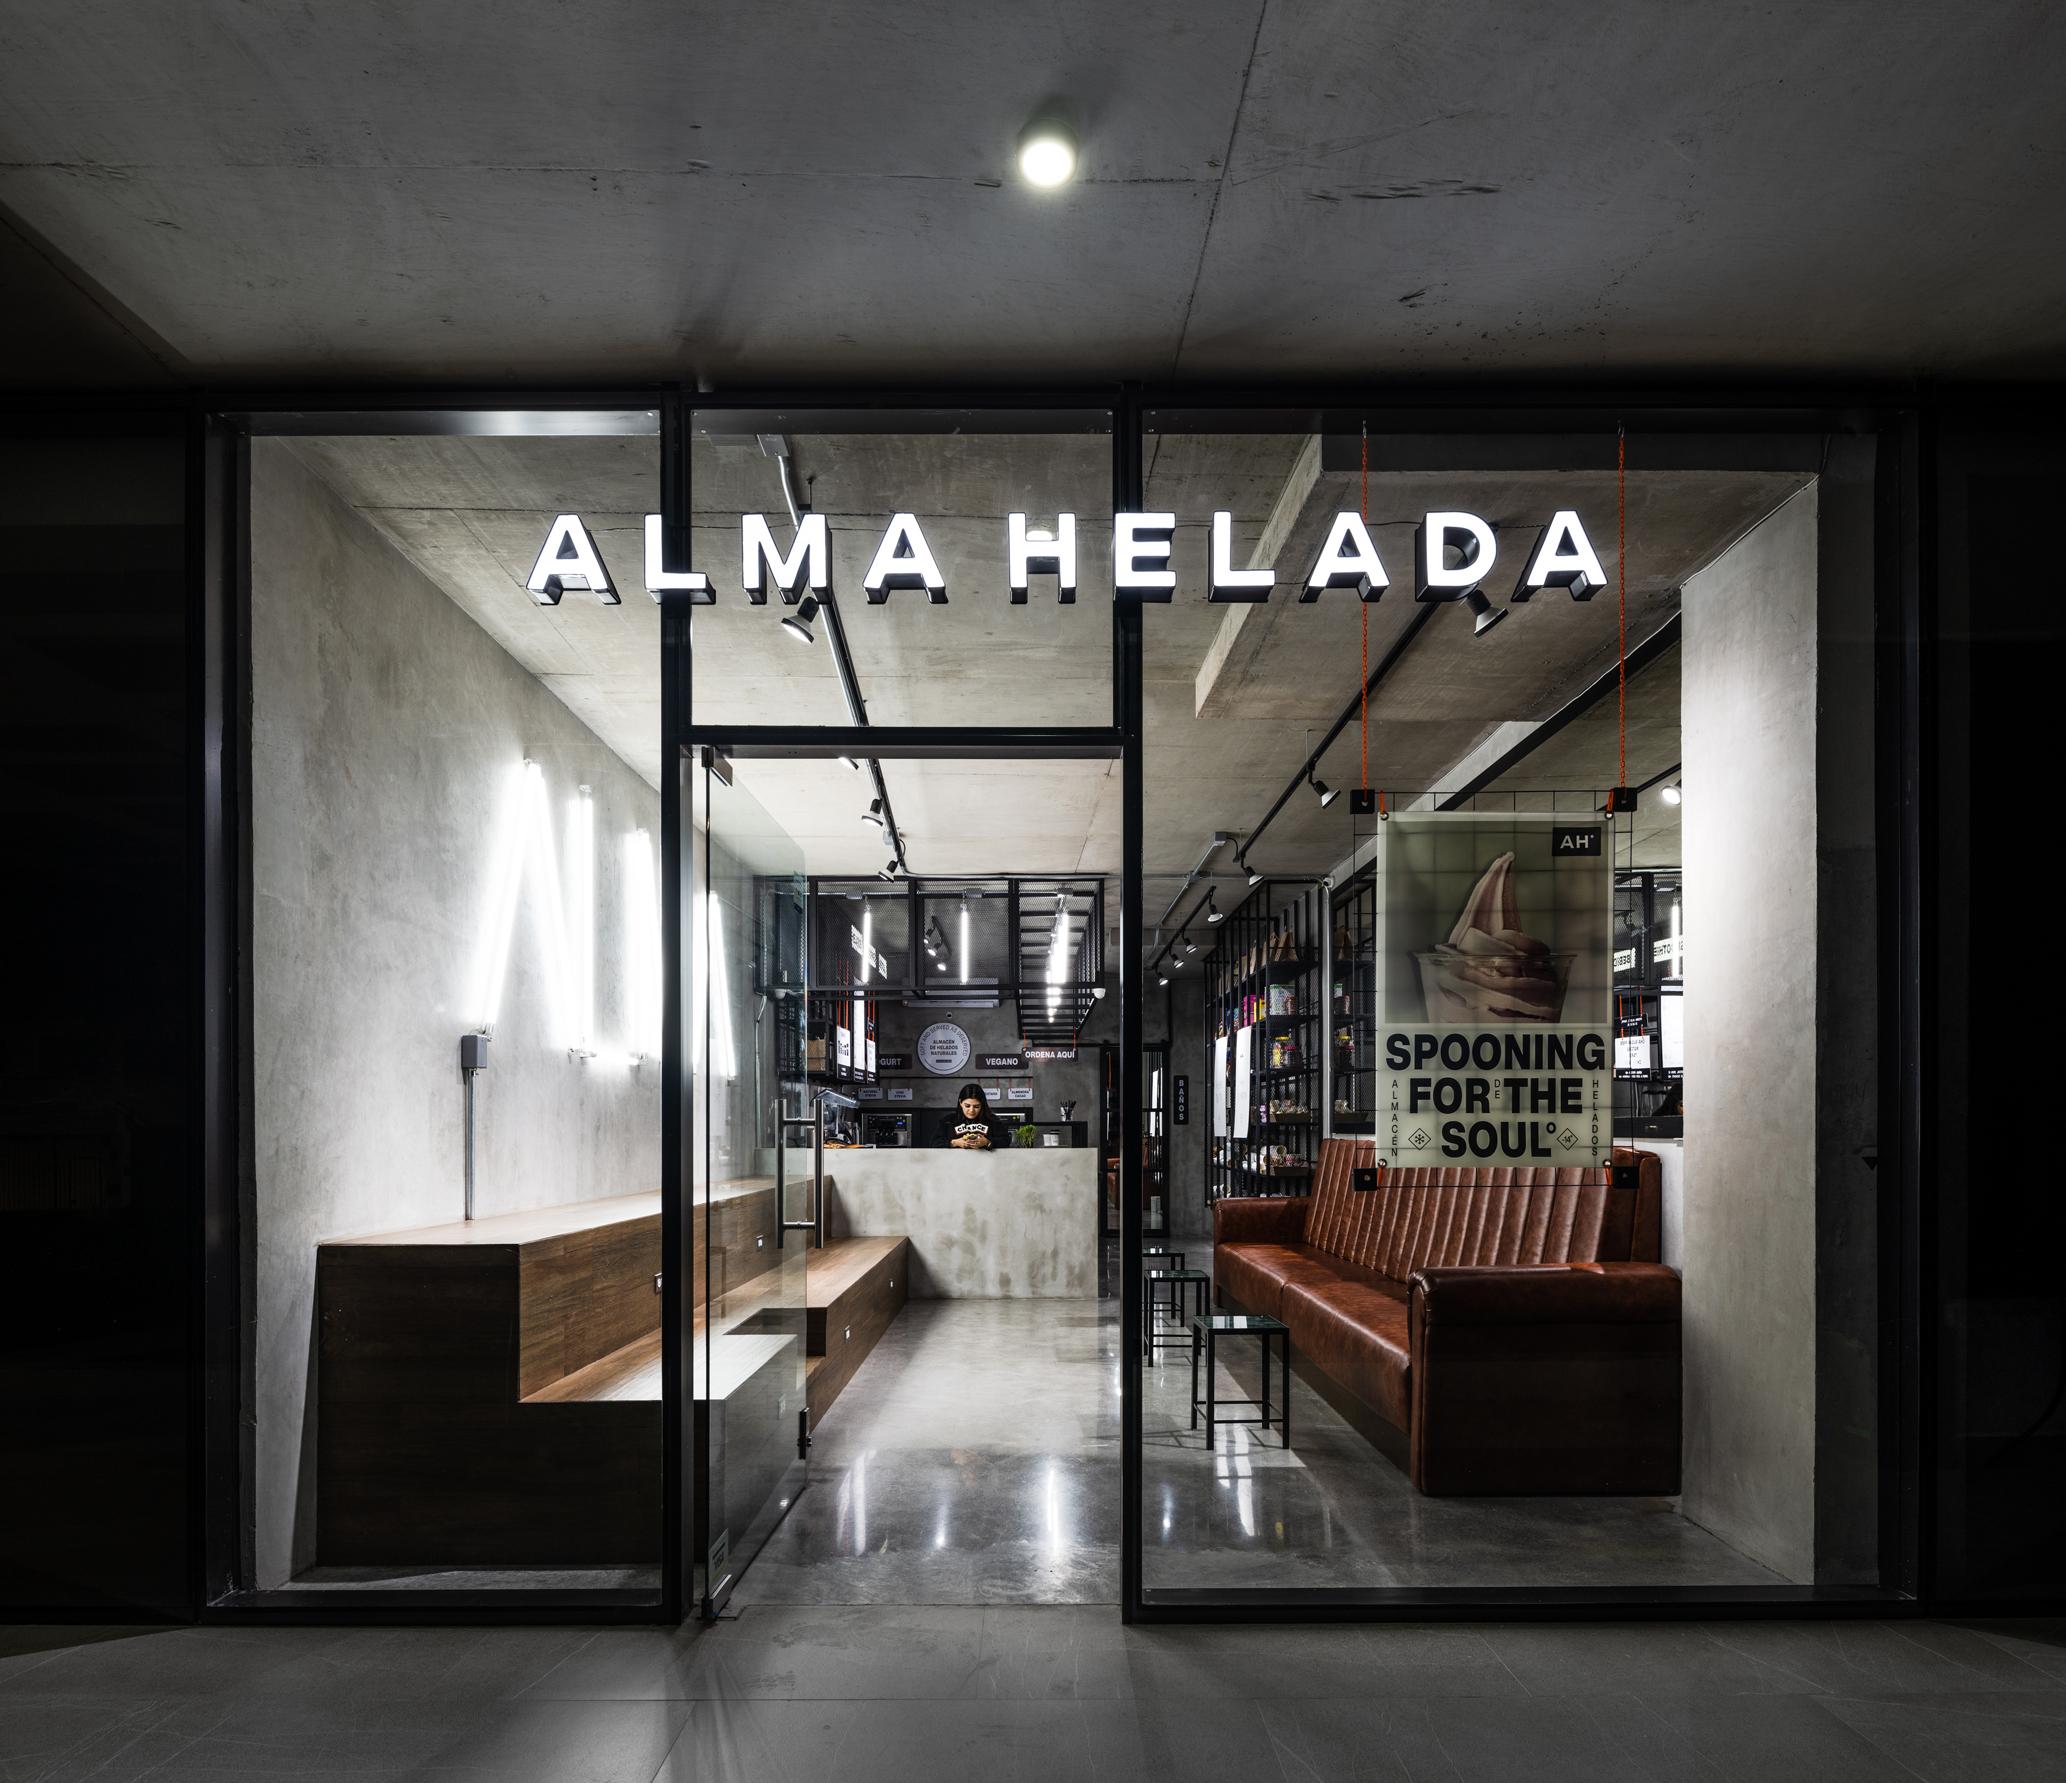 Alma Helada